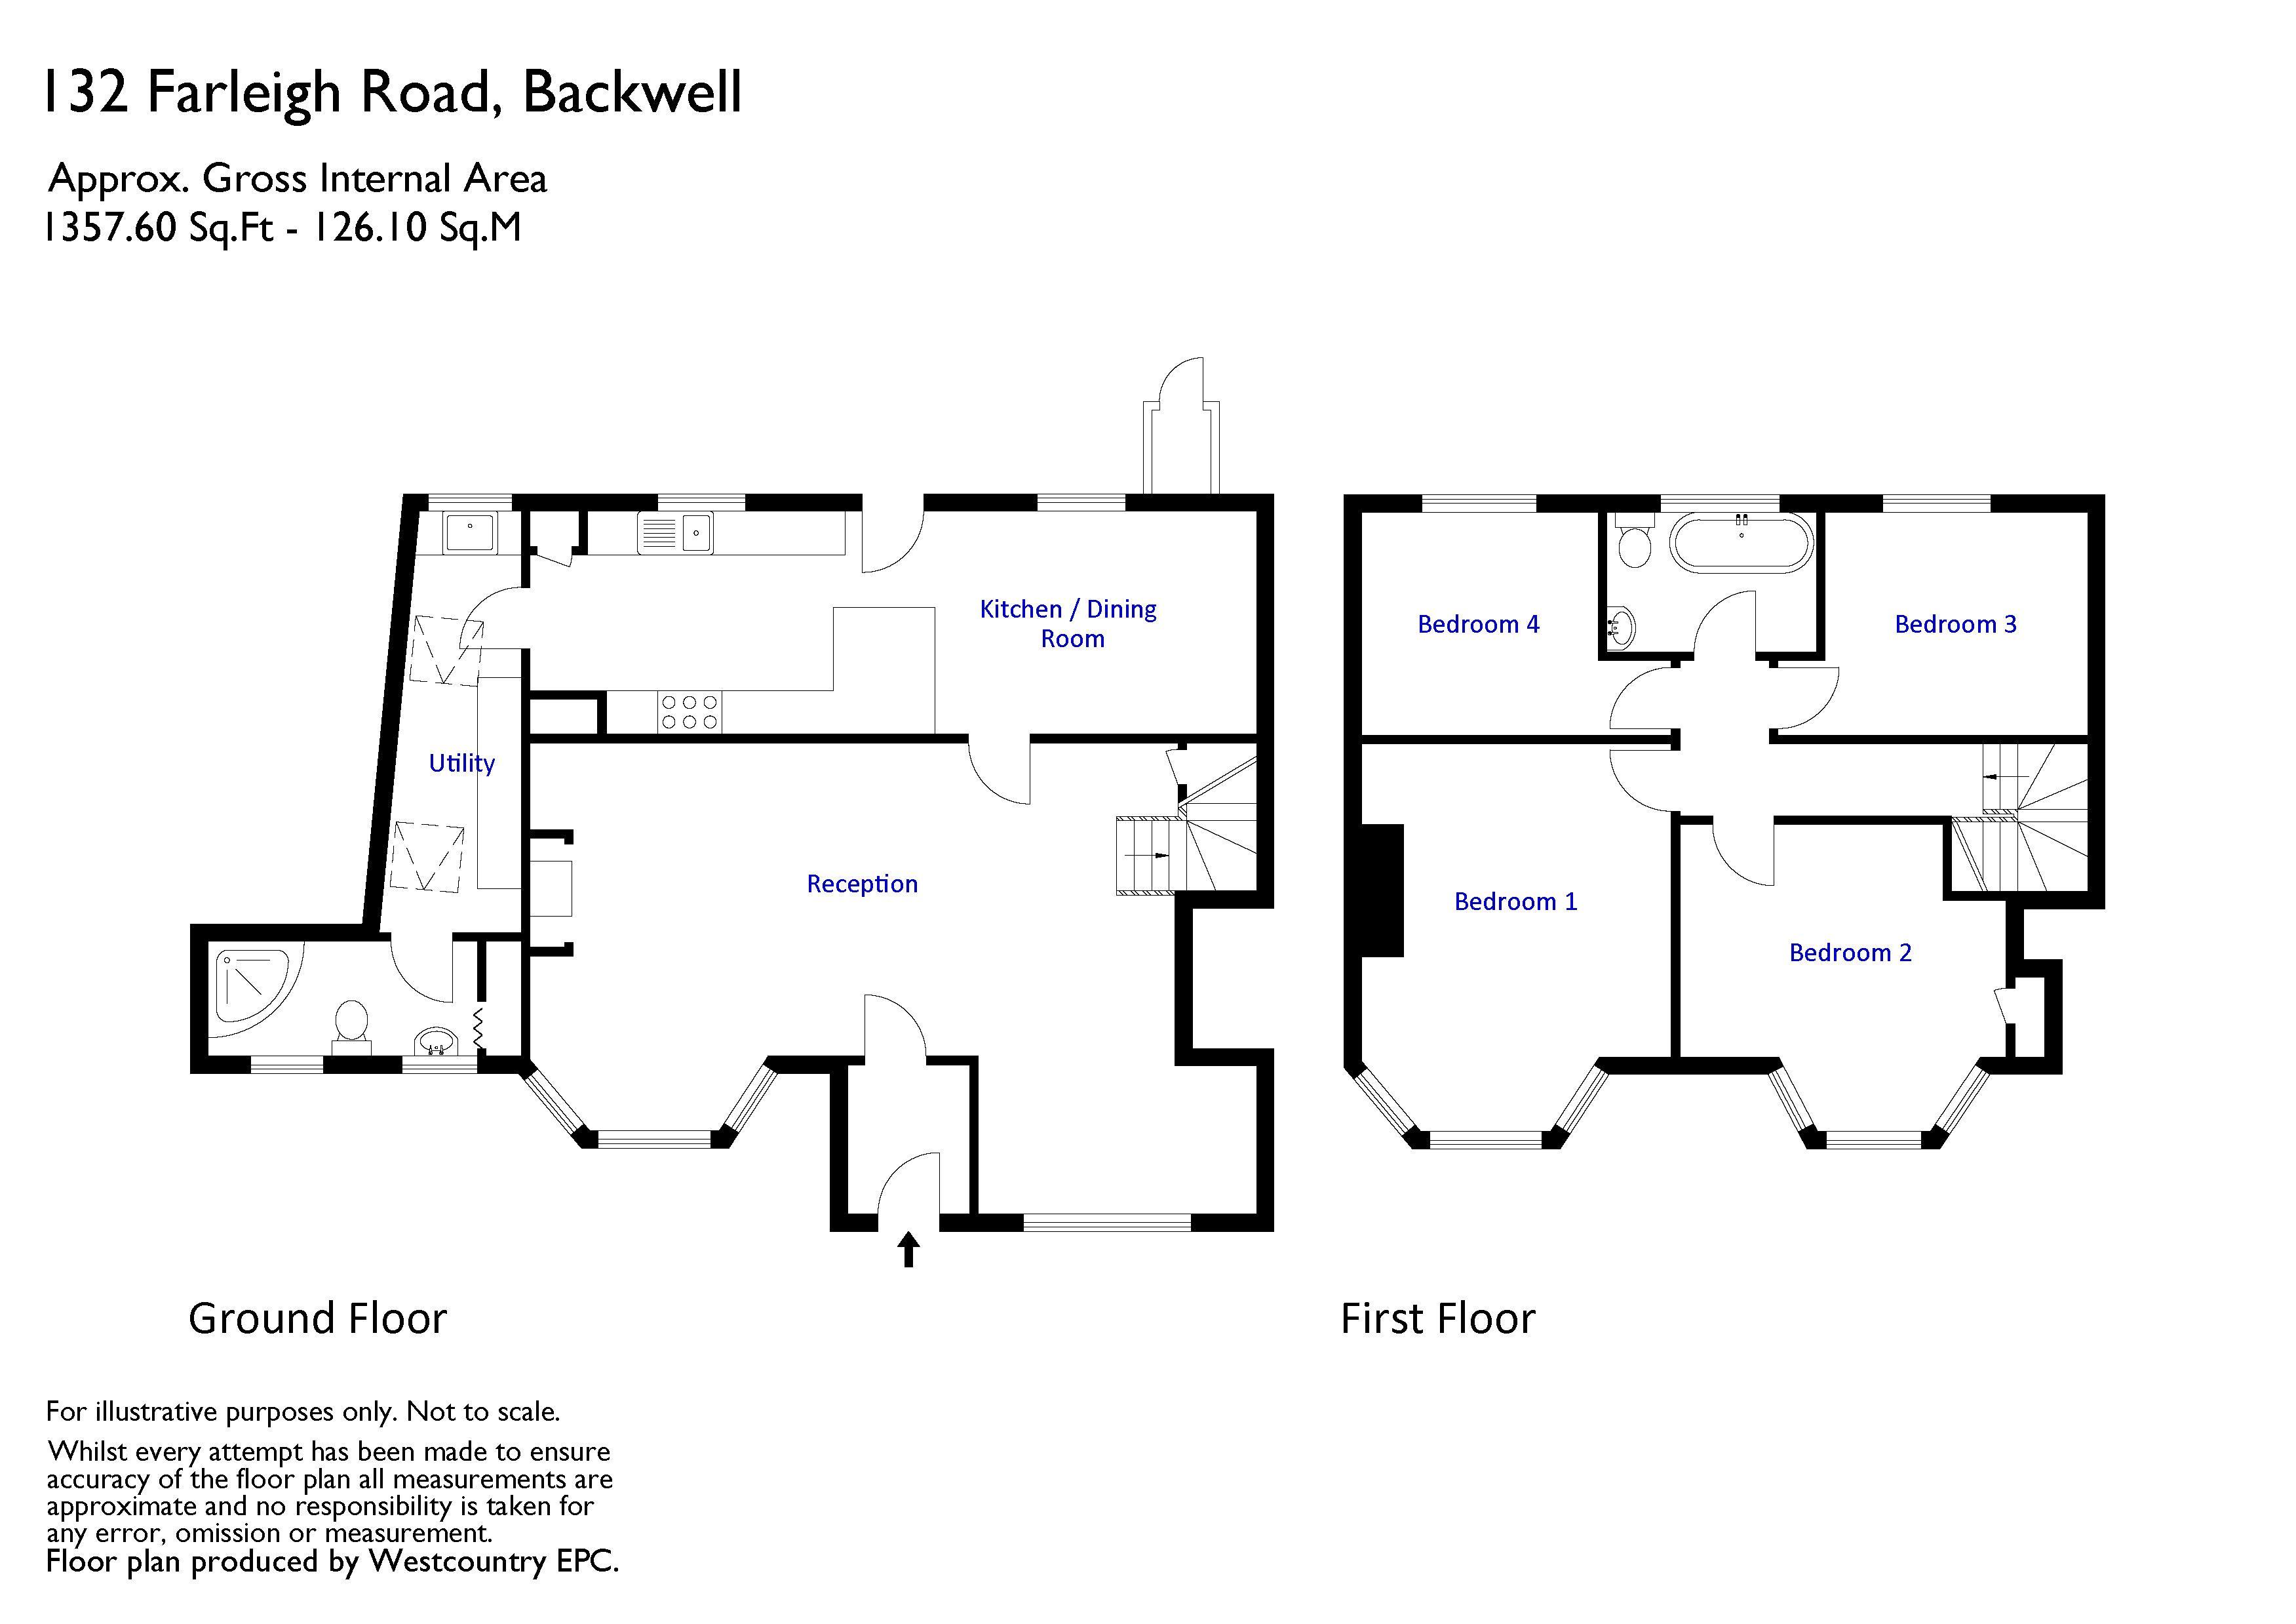 Farleigh Road Backwell